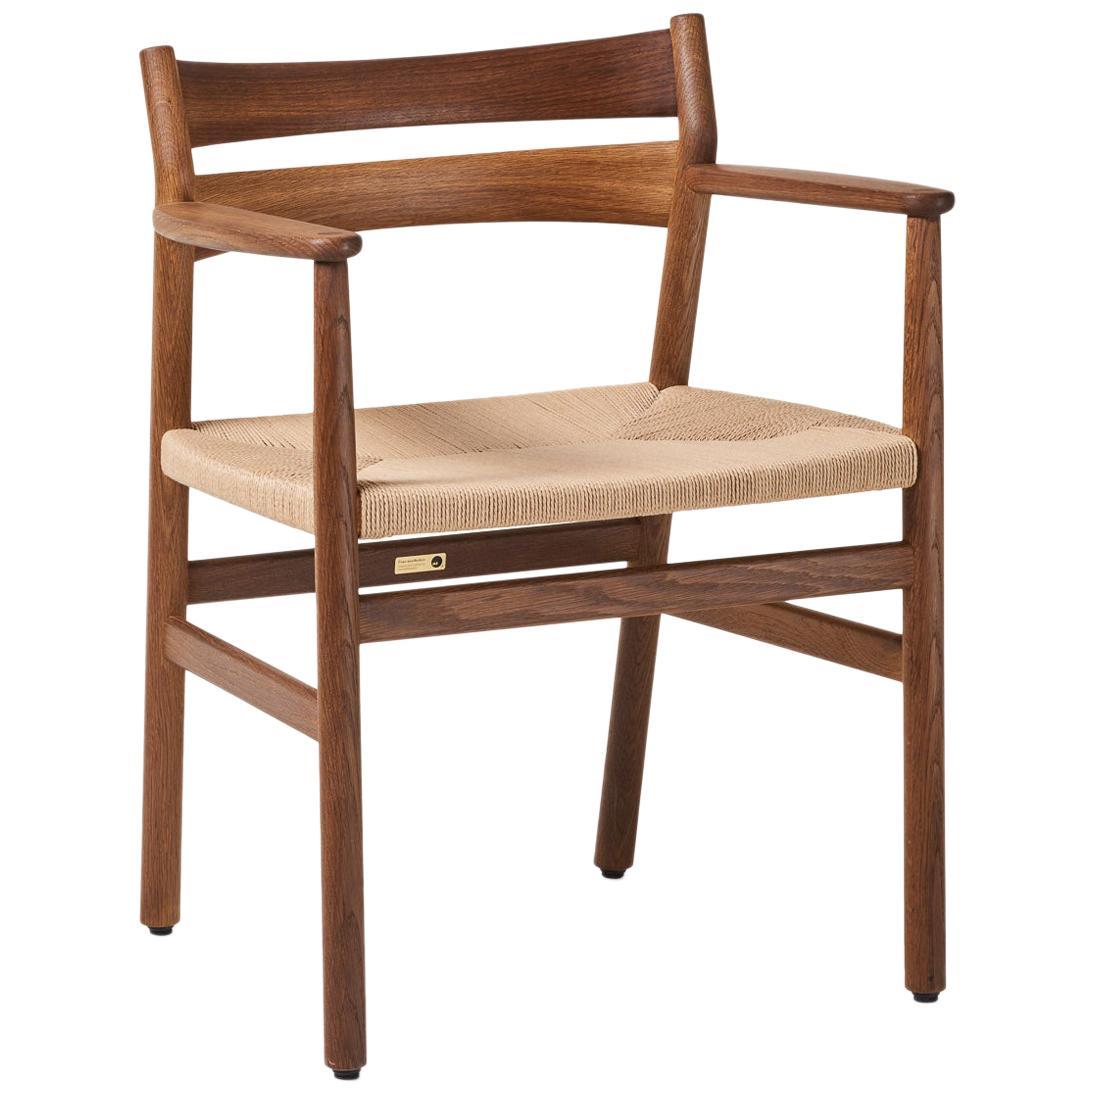 BM2 Chair by Borge Mogensen - Smoked Oak